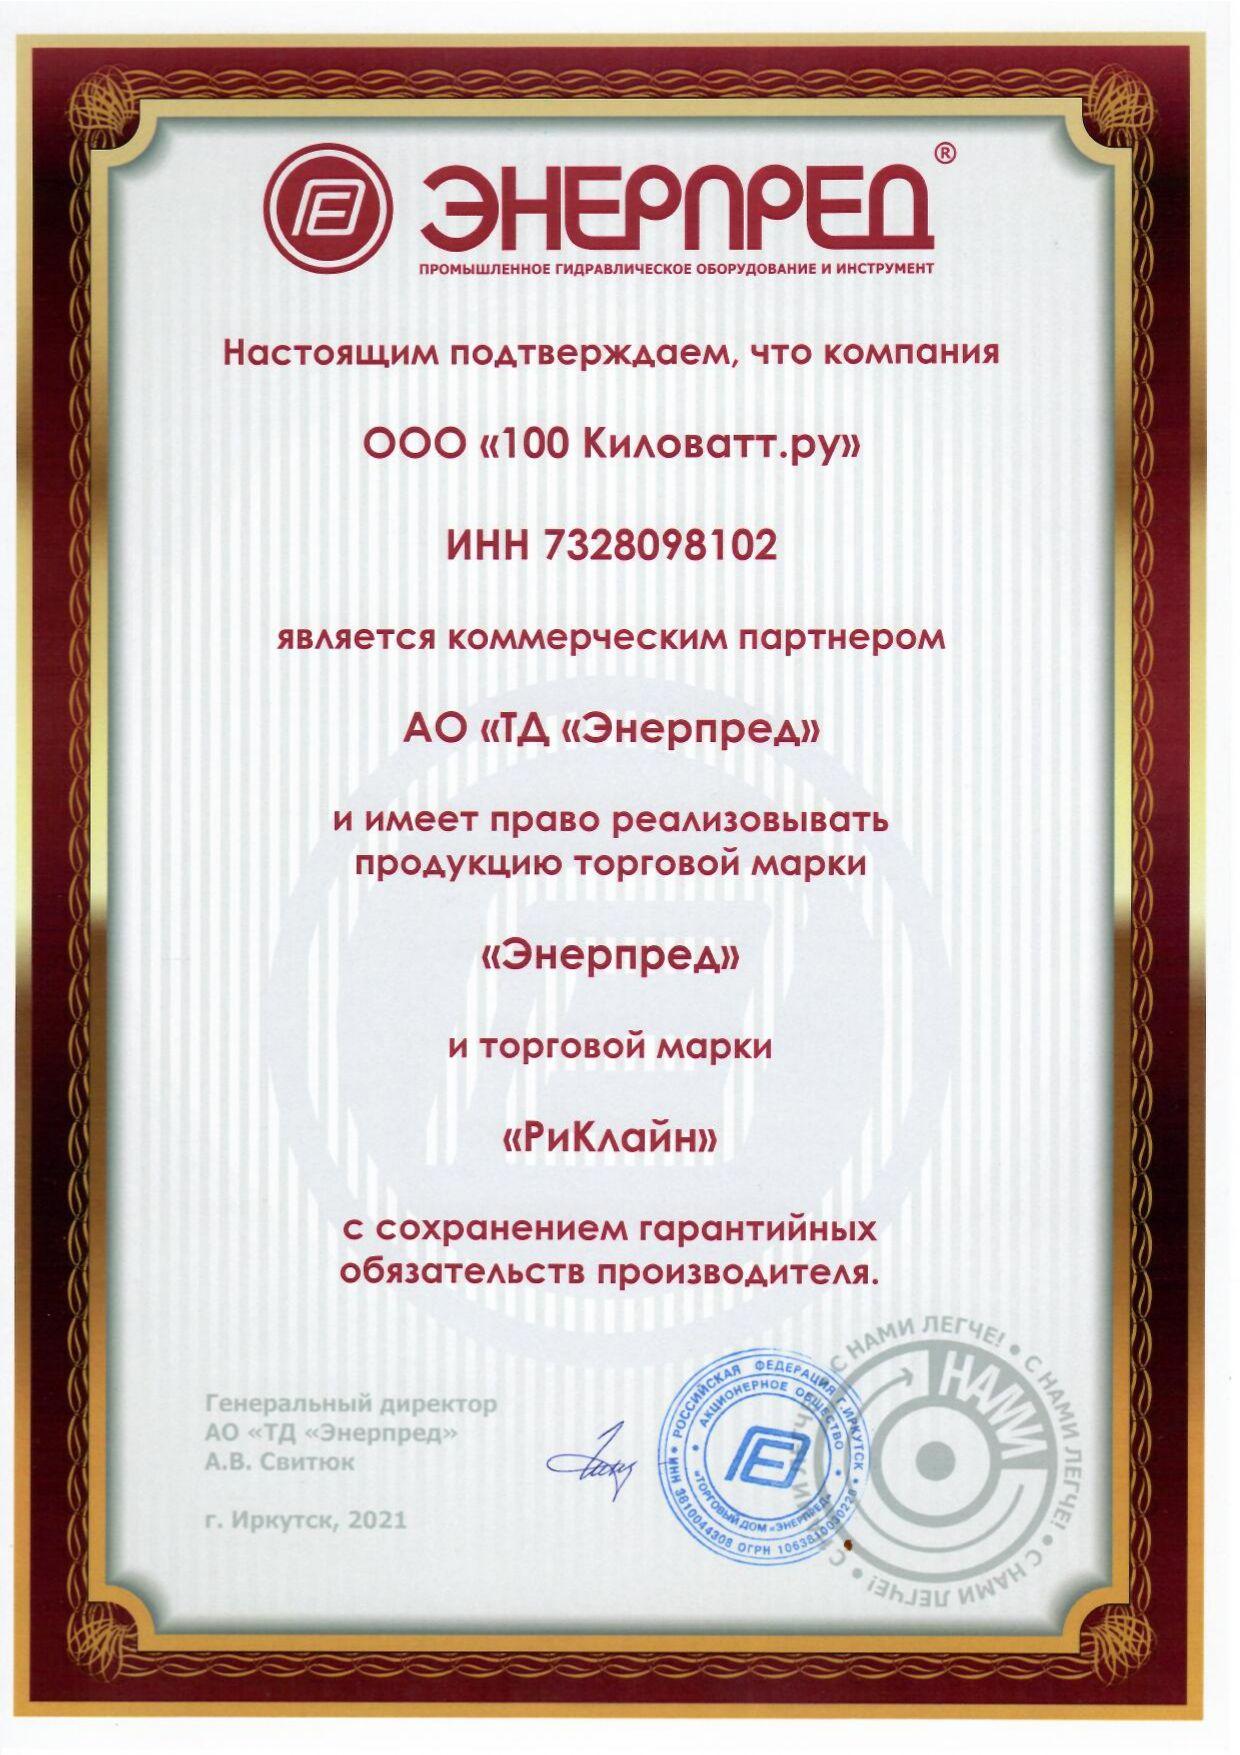 ЭНЕРПРЕД - Сертификат дилера